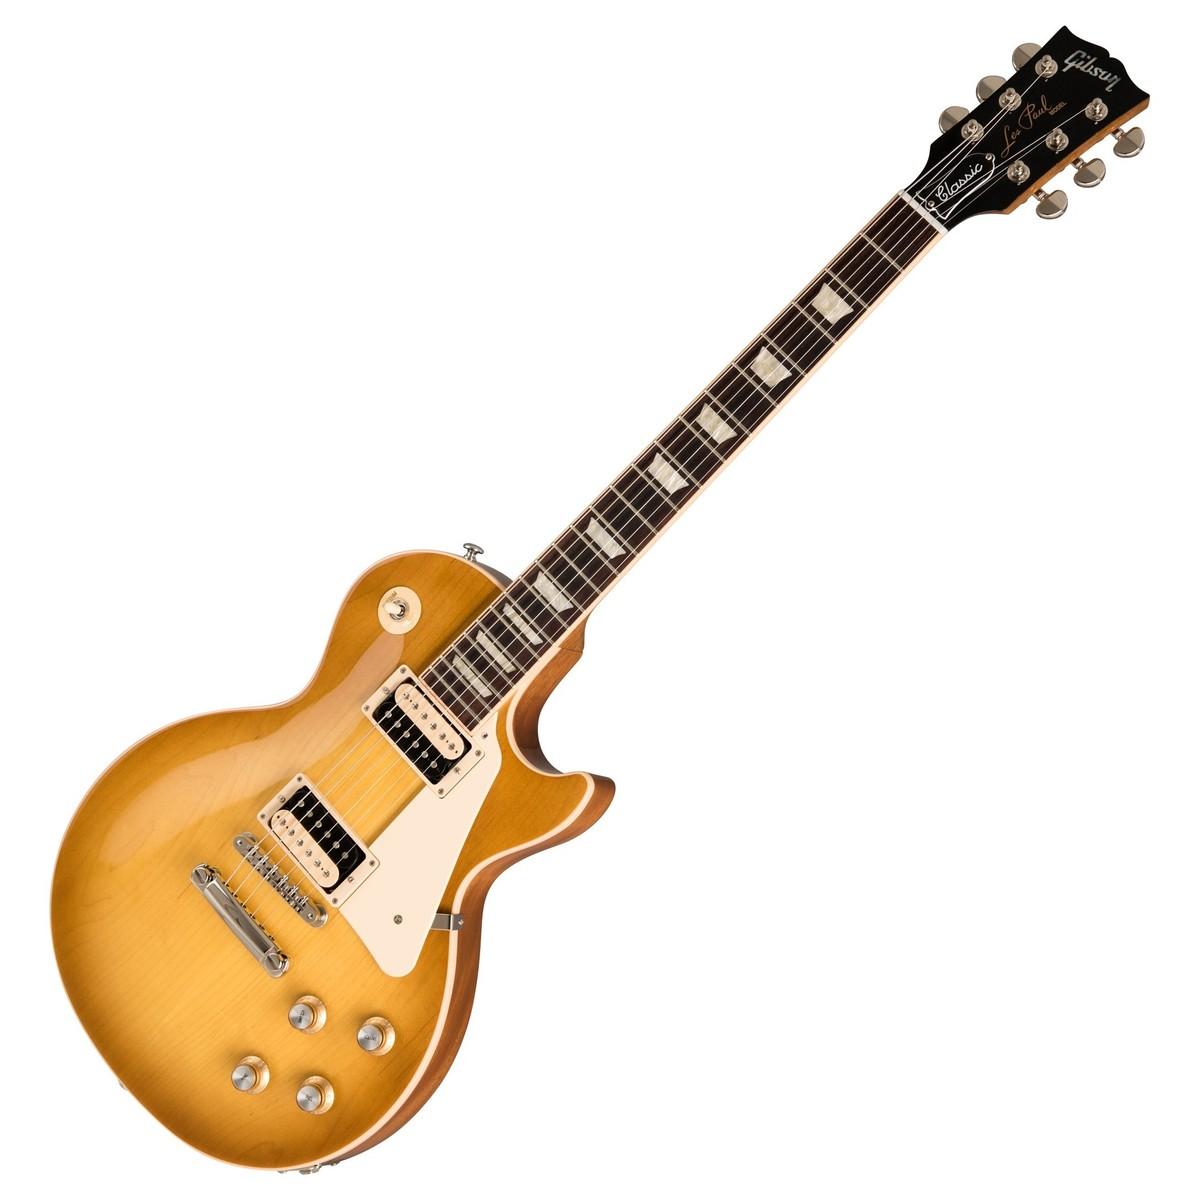 Guitarra Gibson Les Paul clásica